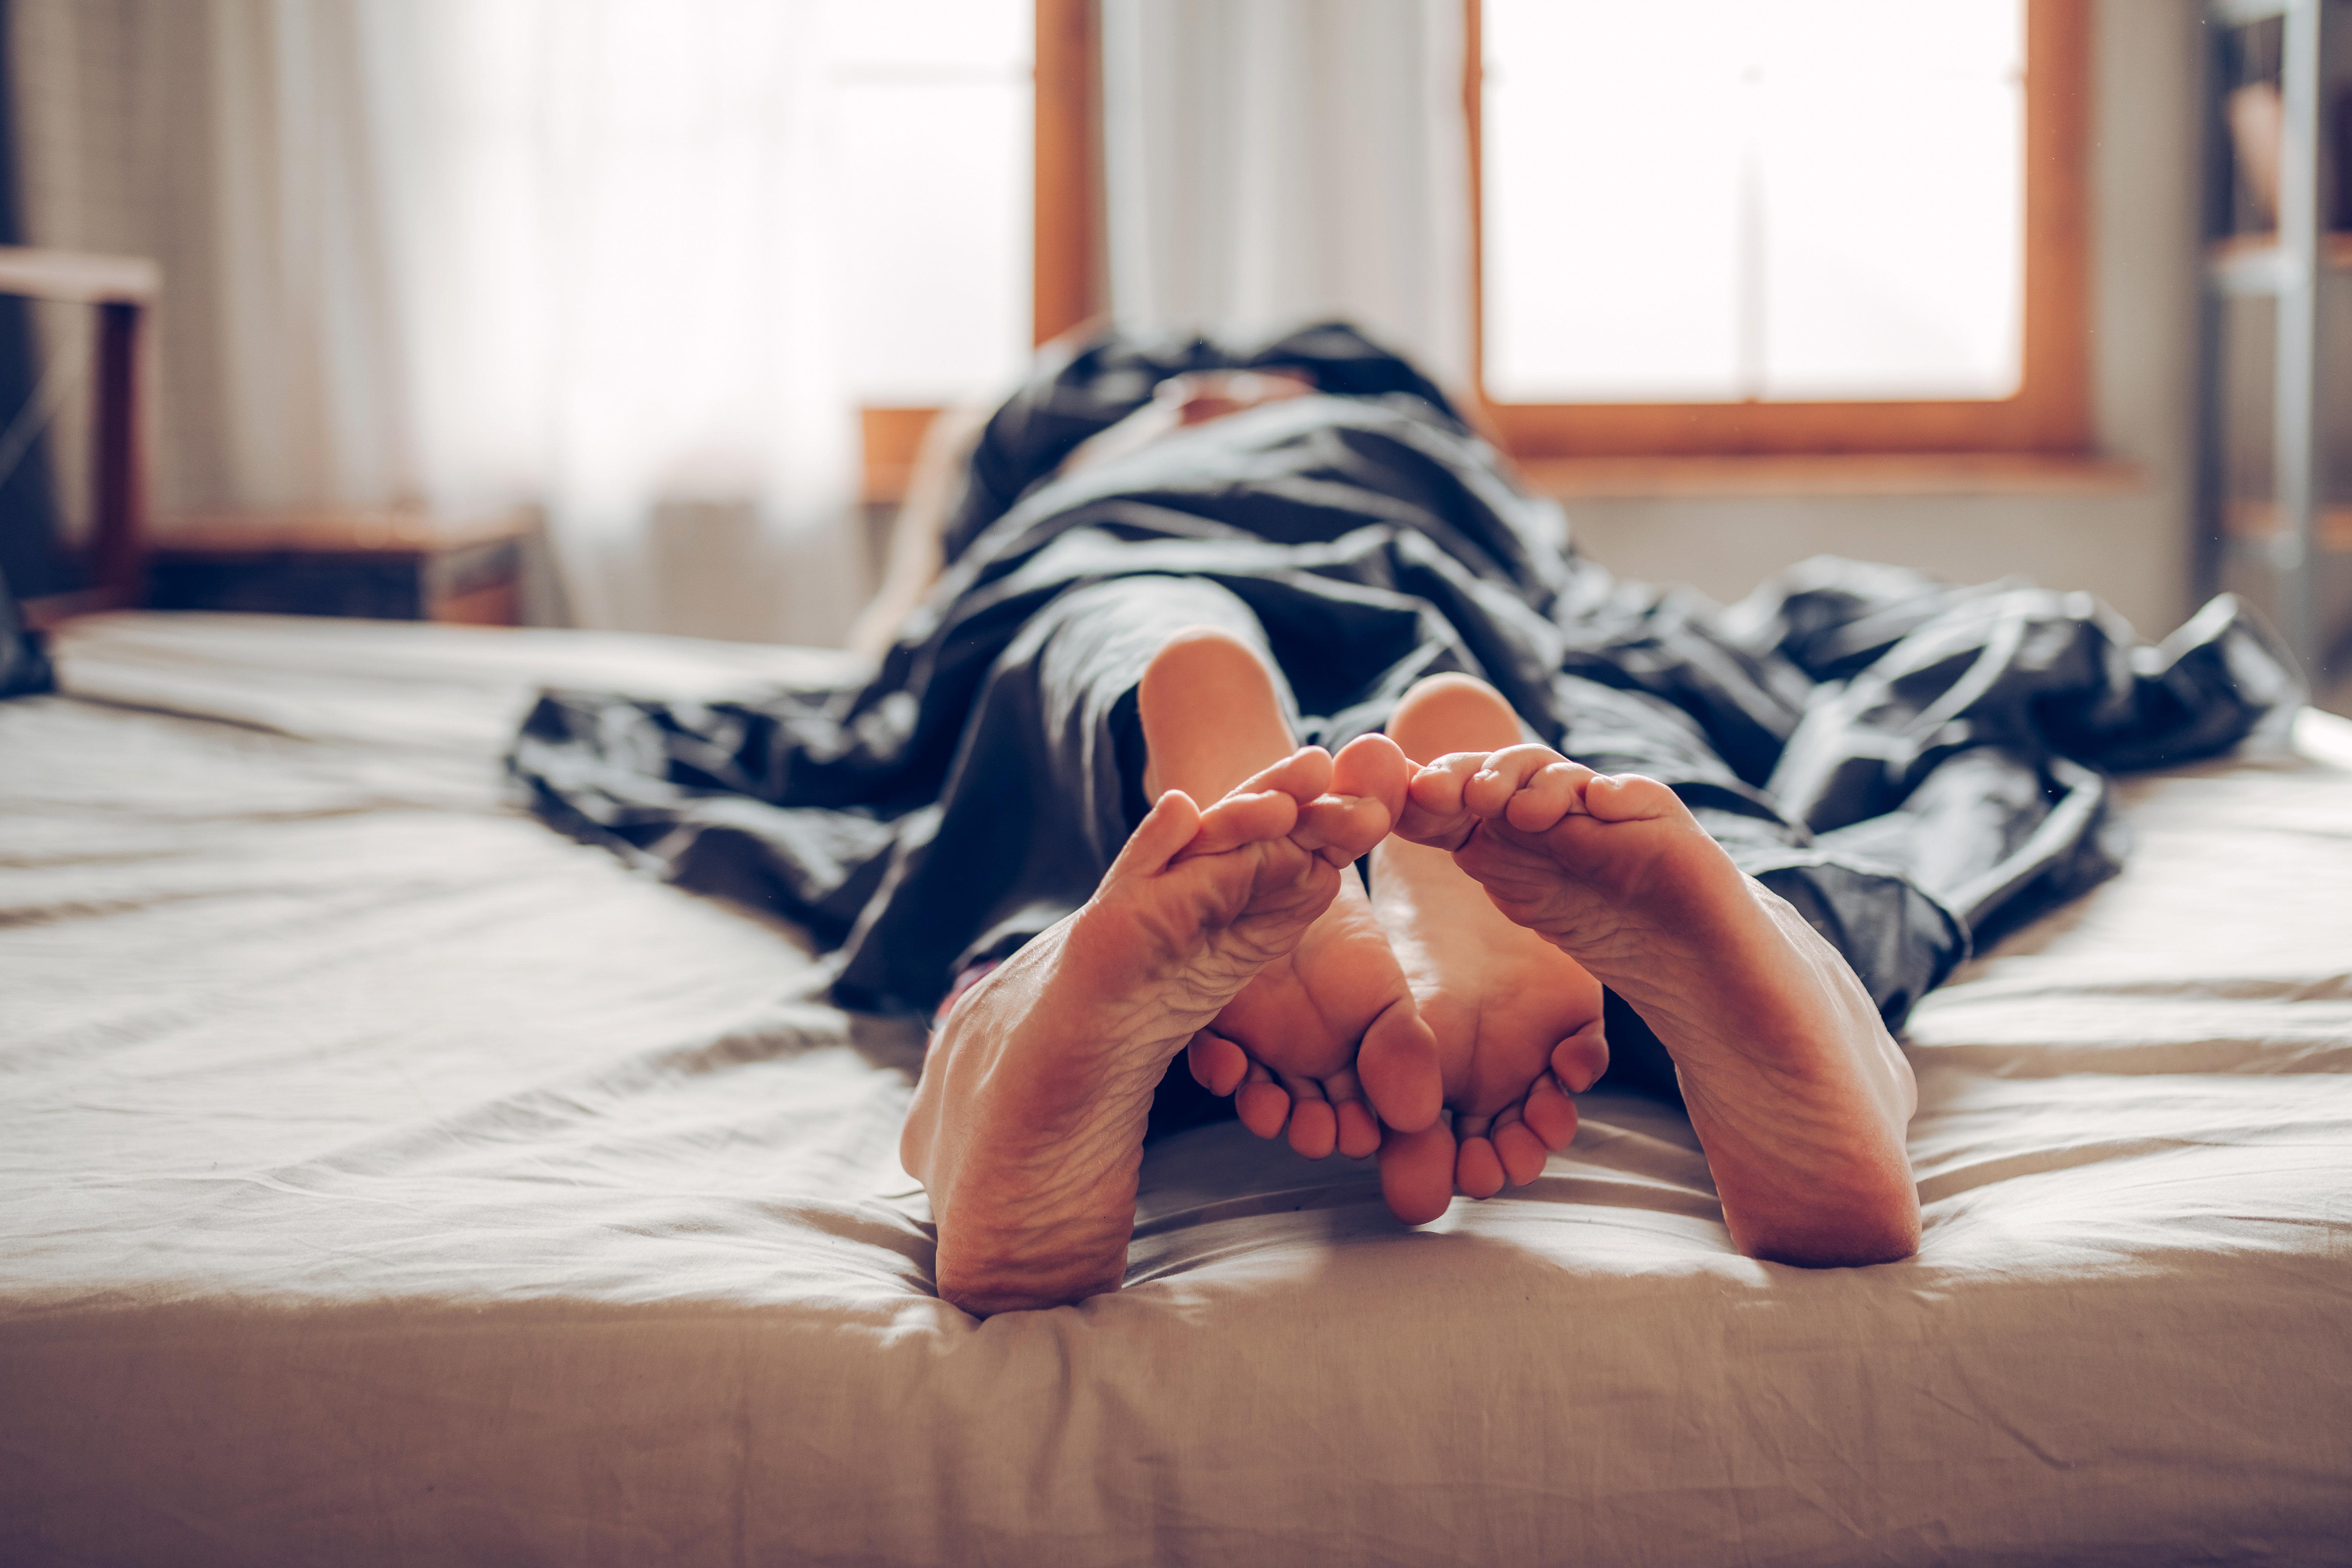 Mackenzie Reai 100 E Sexo Sexo Cache Vaginal Reaisoral